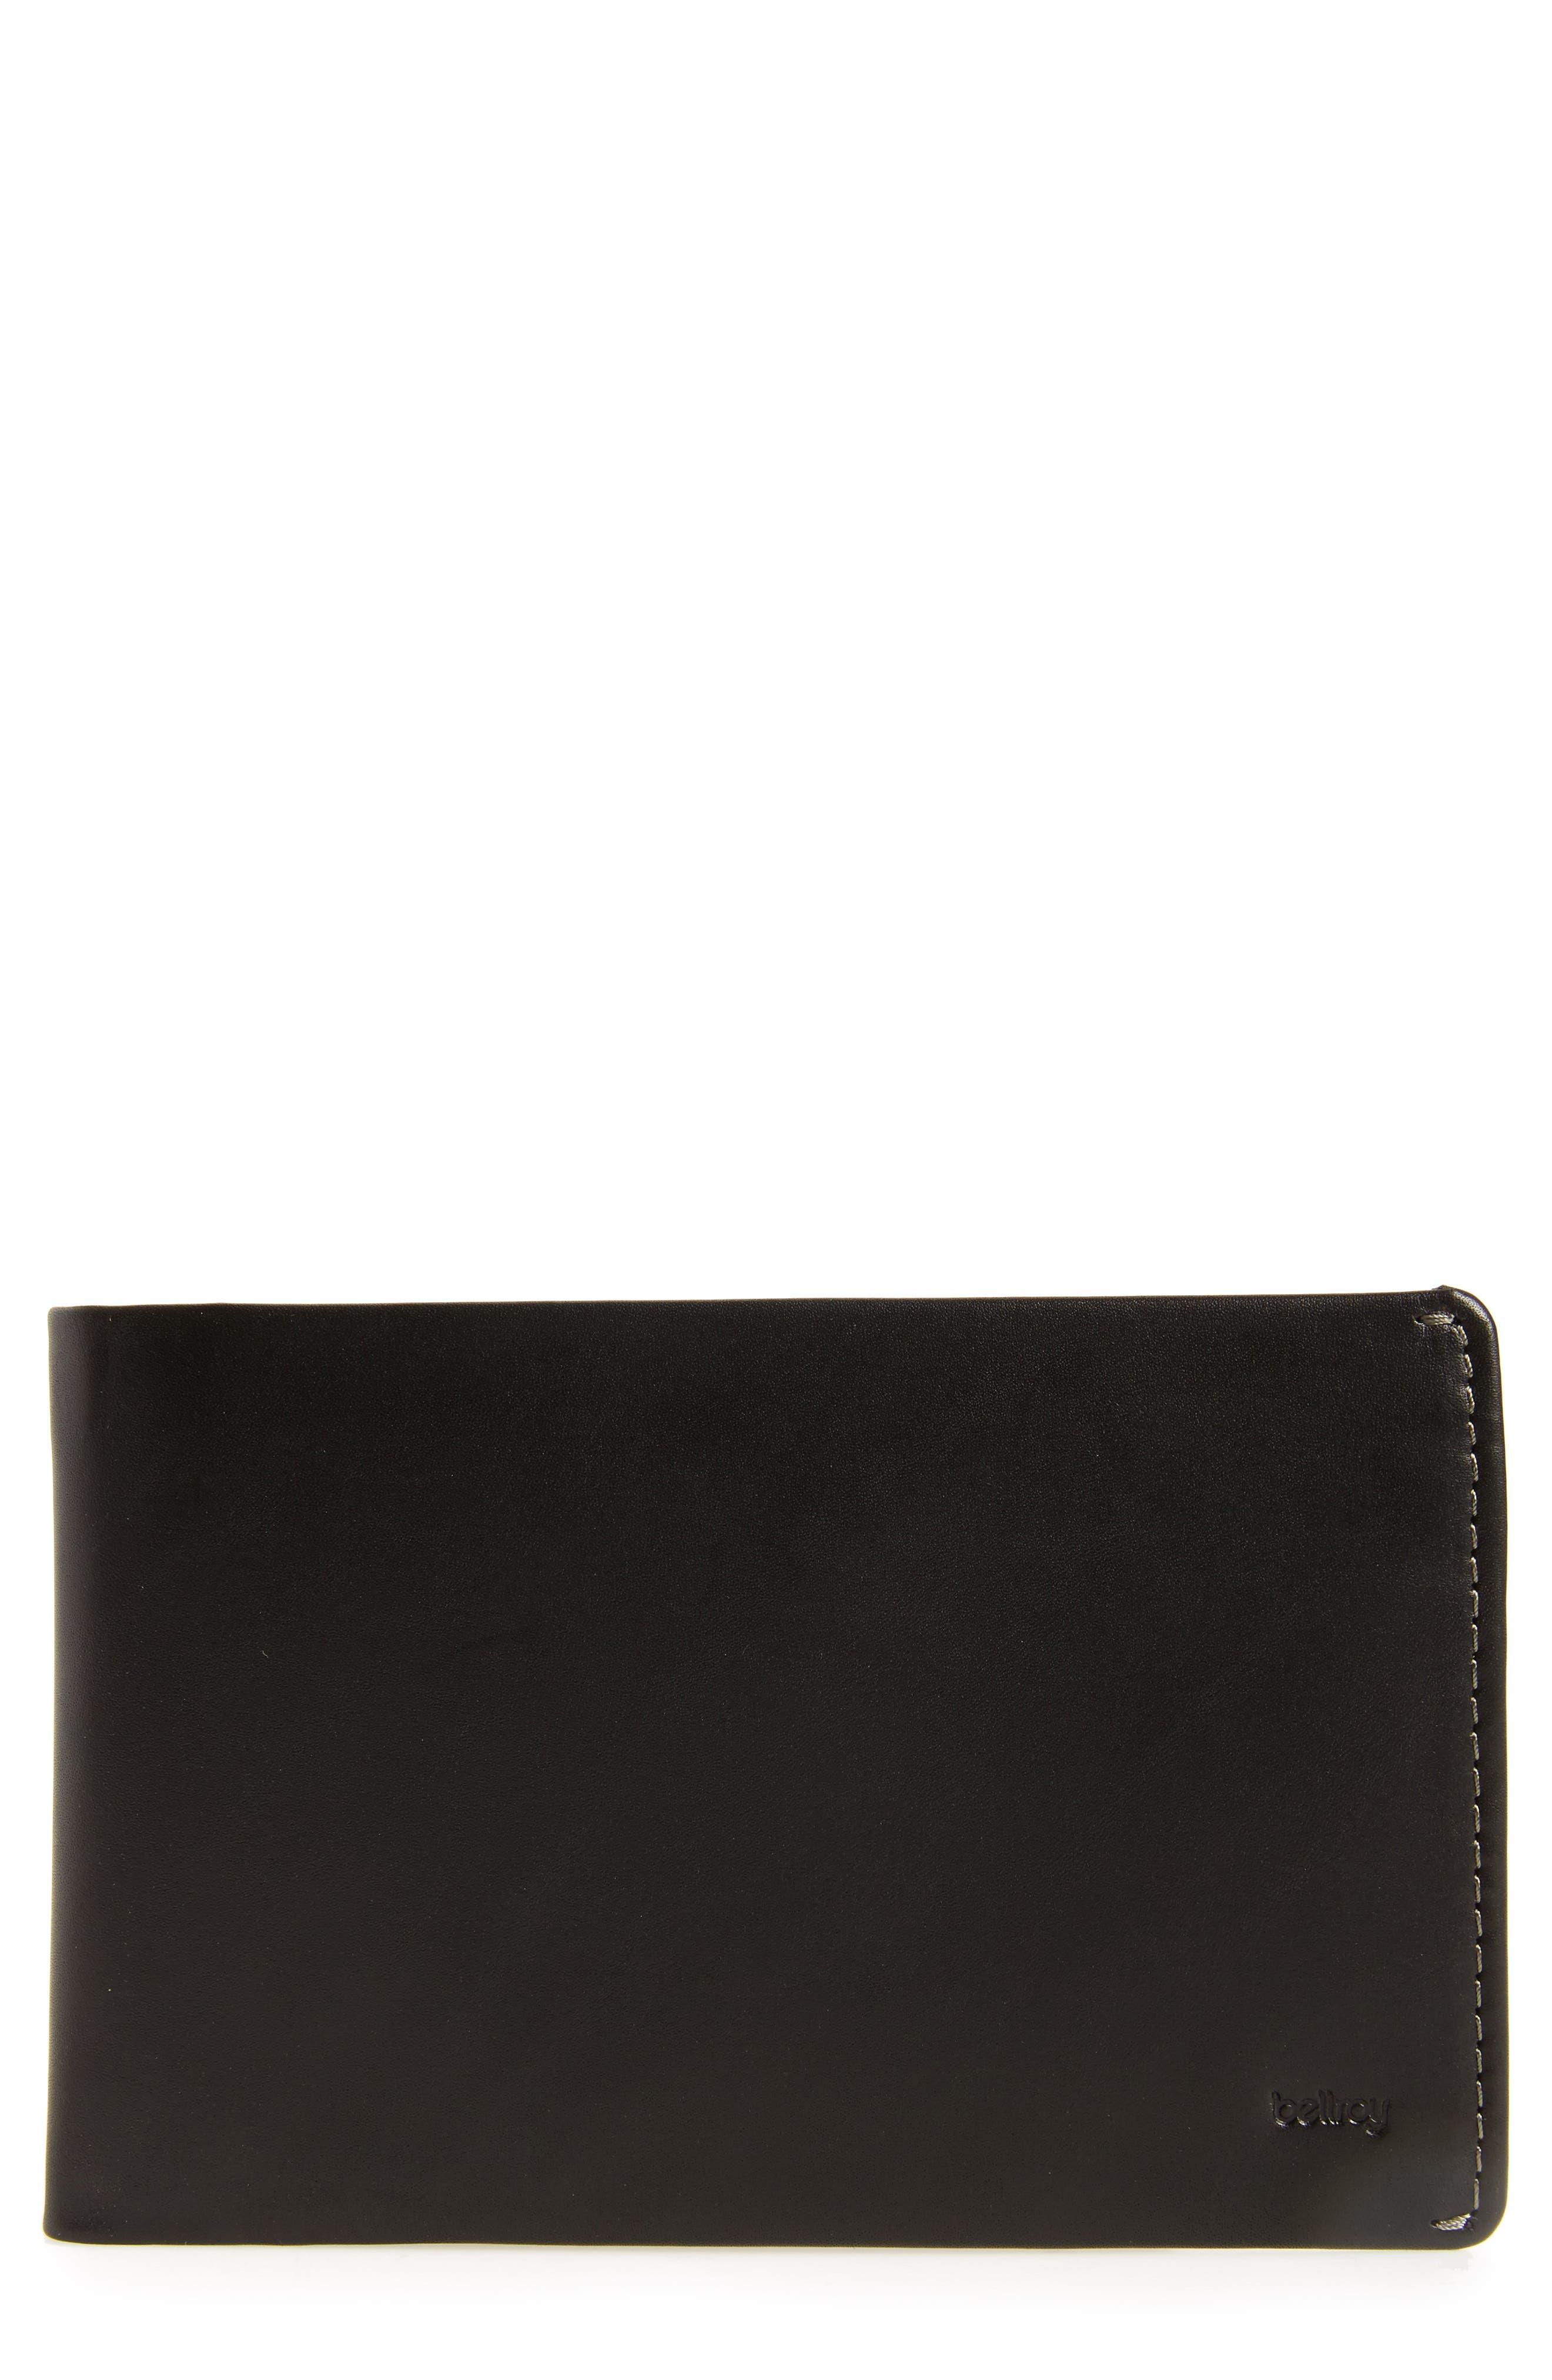 Main Image - Bellroy RFID Travel Wallet